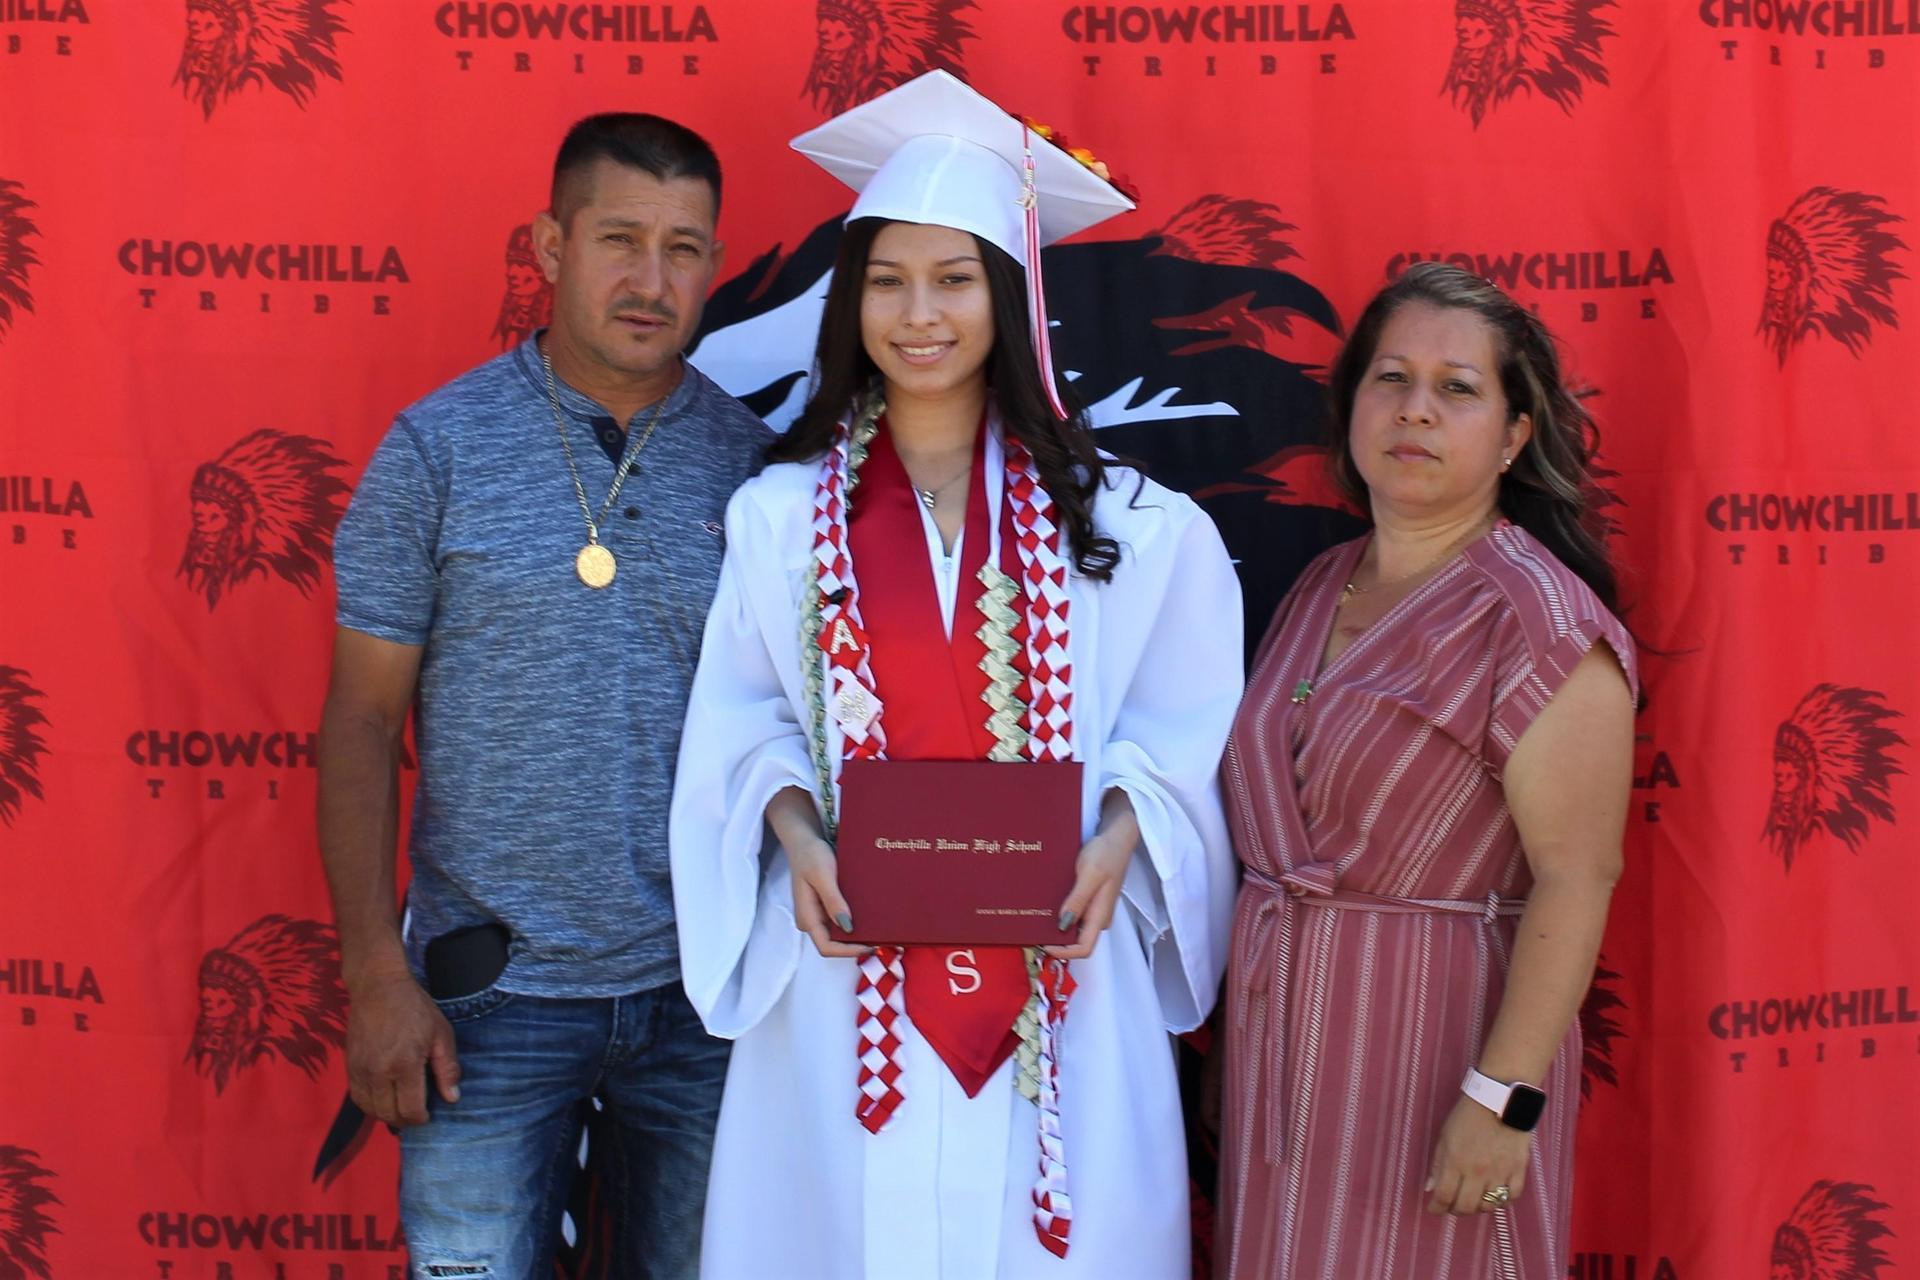 Annai Martinez and family